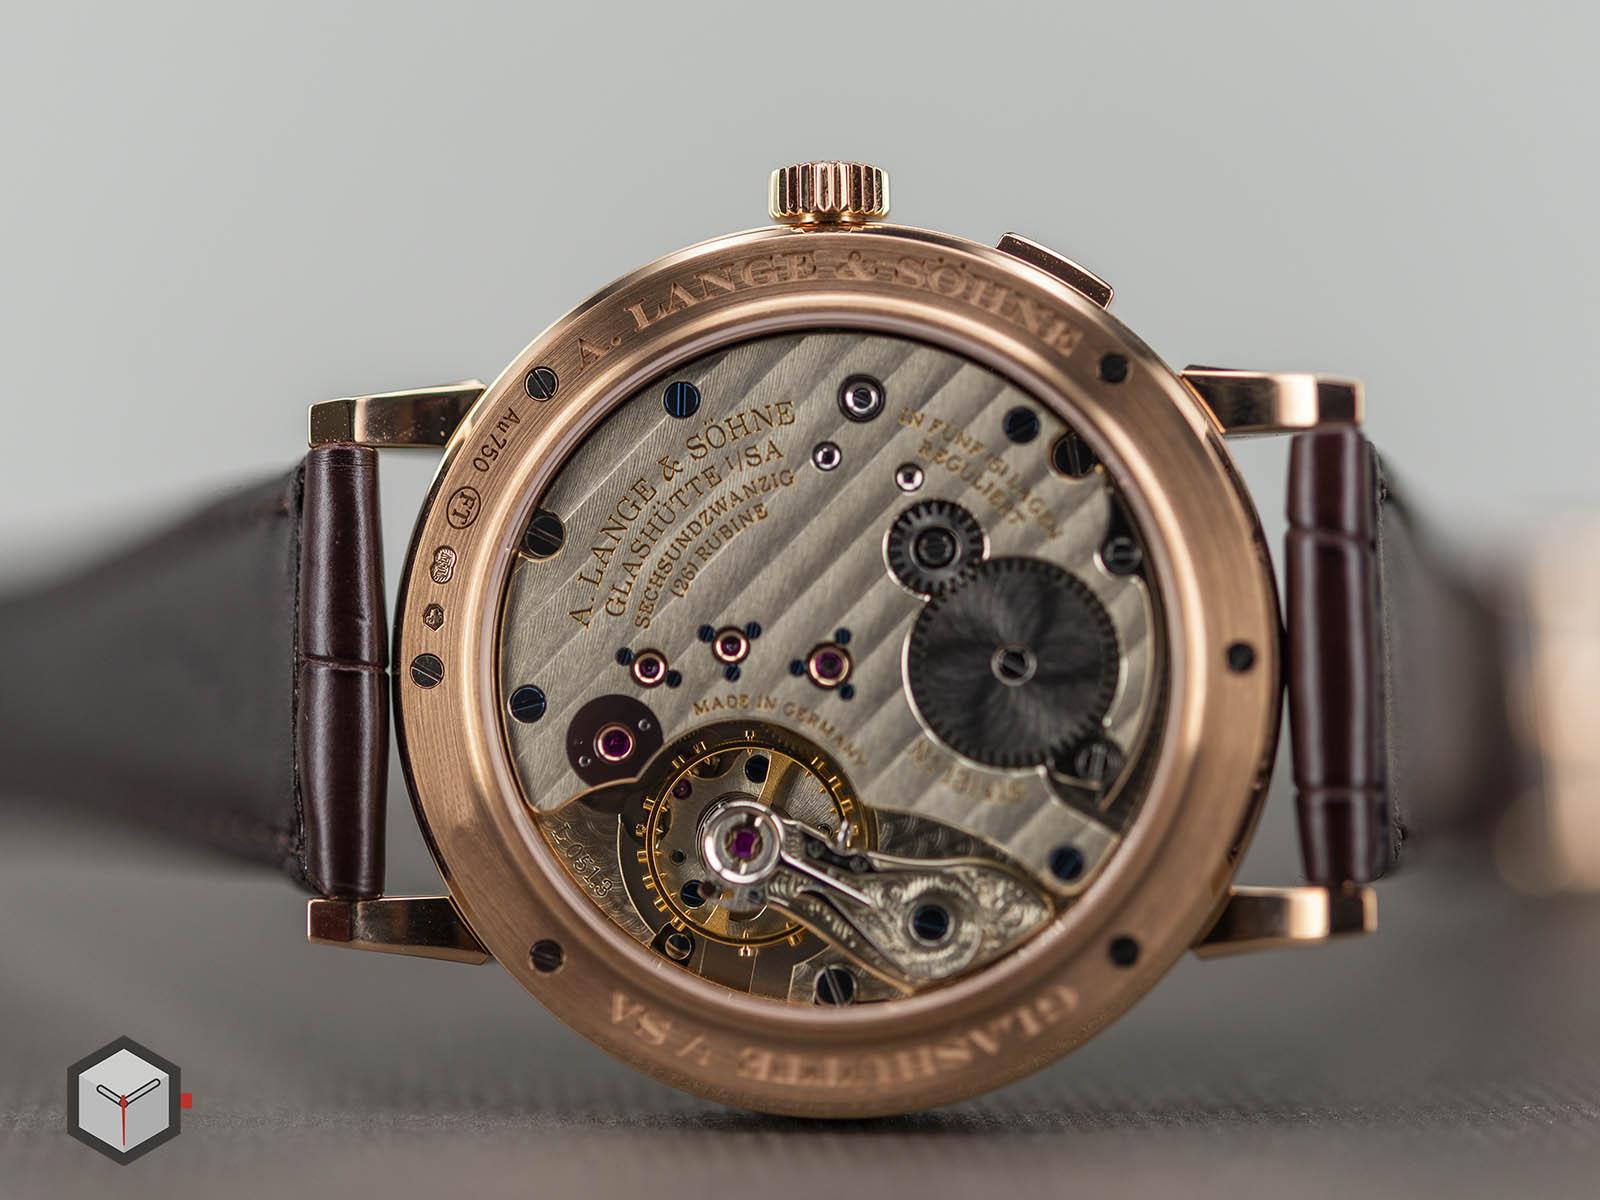 238-032-a-lange-sohne-1815-annual-calendar-18k-pink-gold-8.jpg